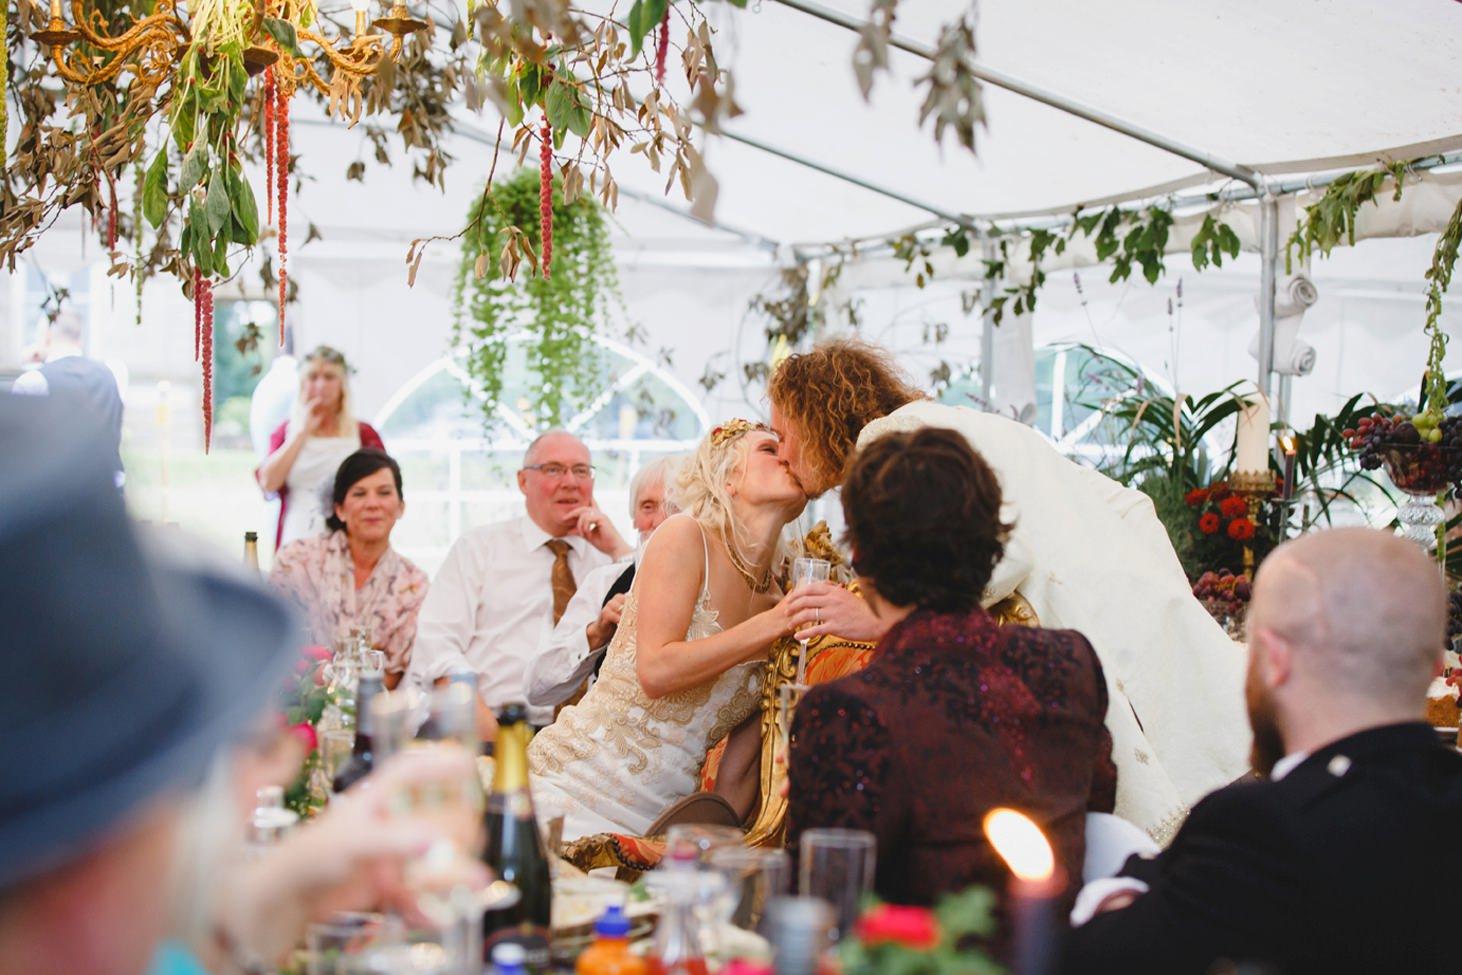 mount stuart wedding photography bride and groom speech kiss